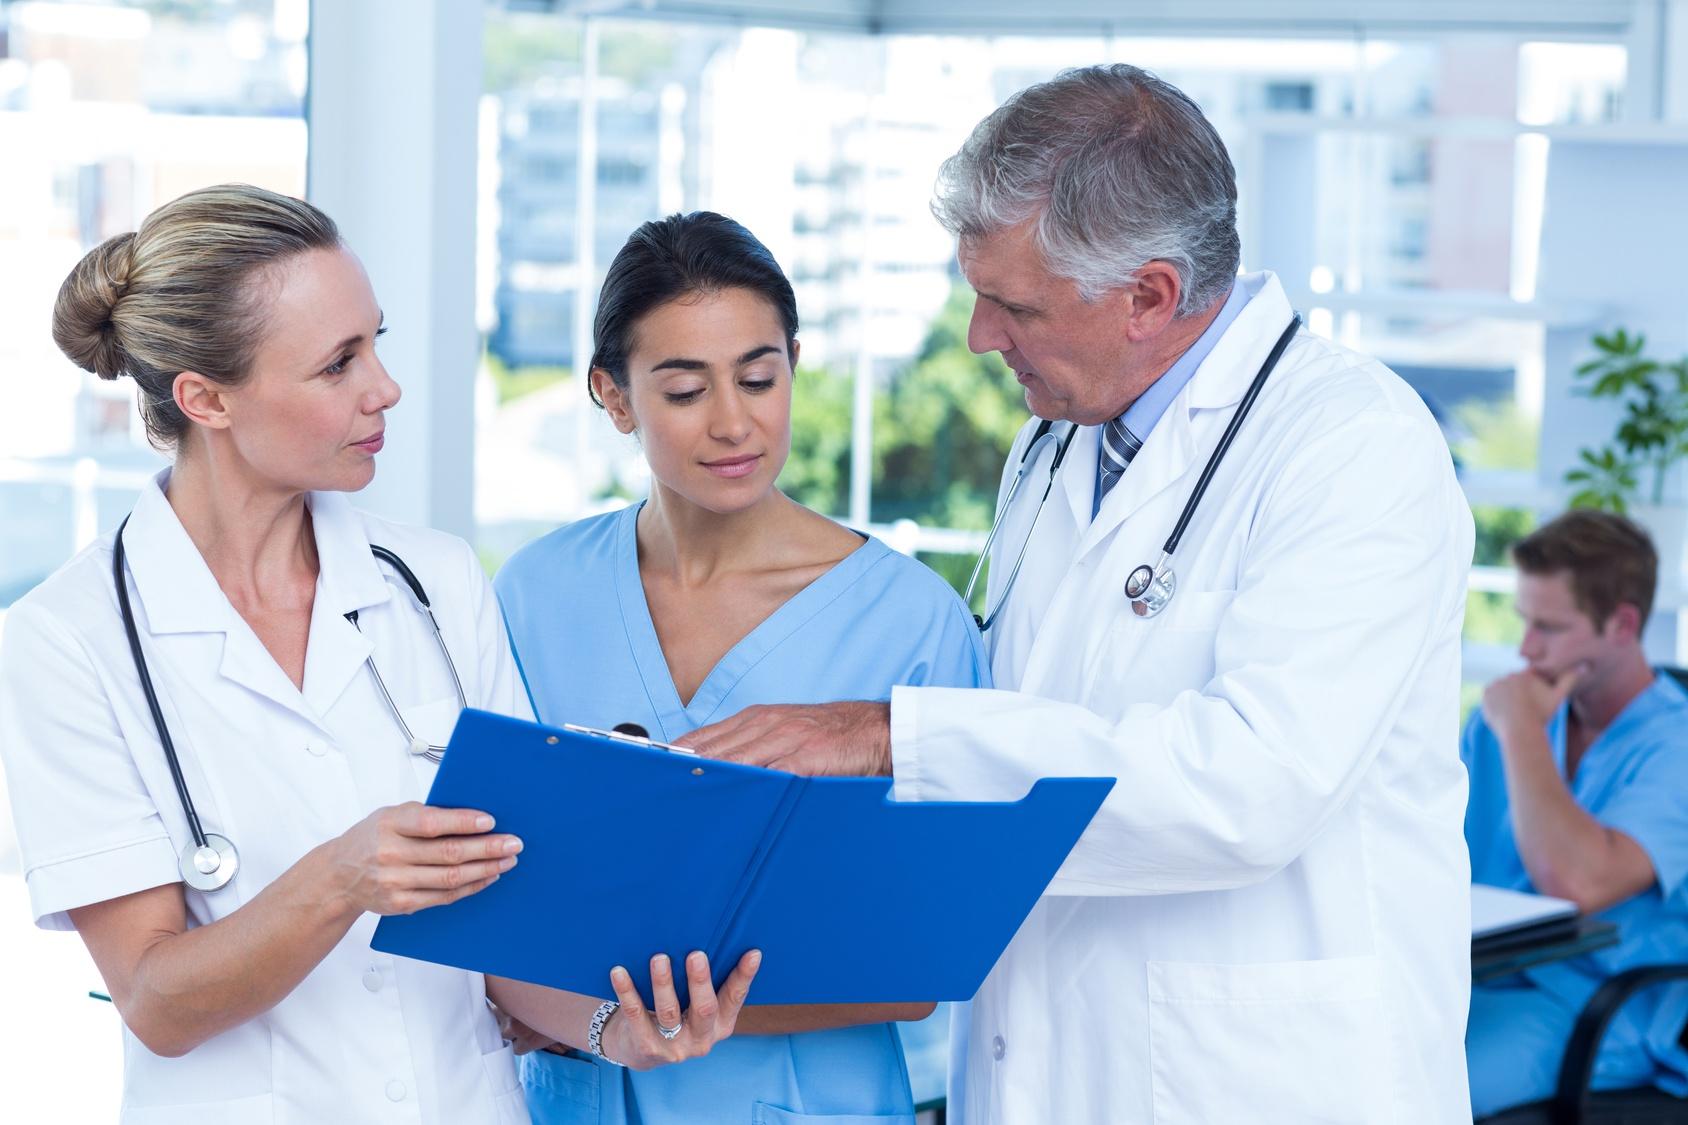 Medizinische Berufe: Die 5 besten Berufe | Heimarbeit.de √